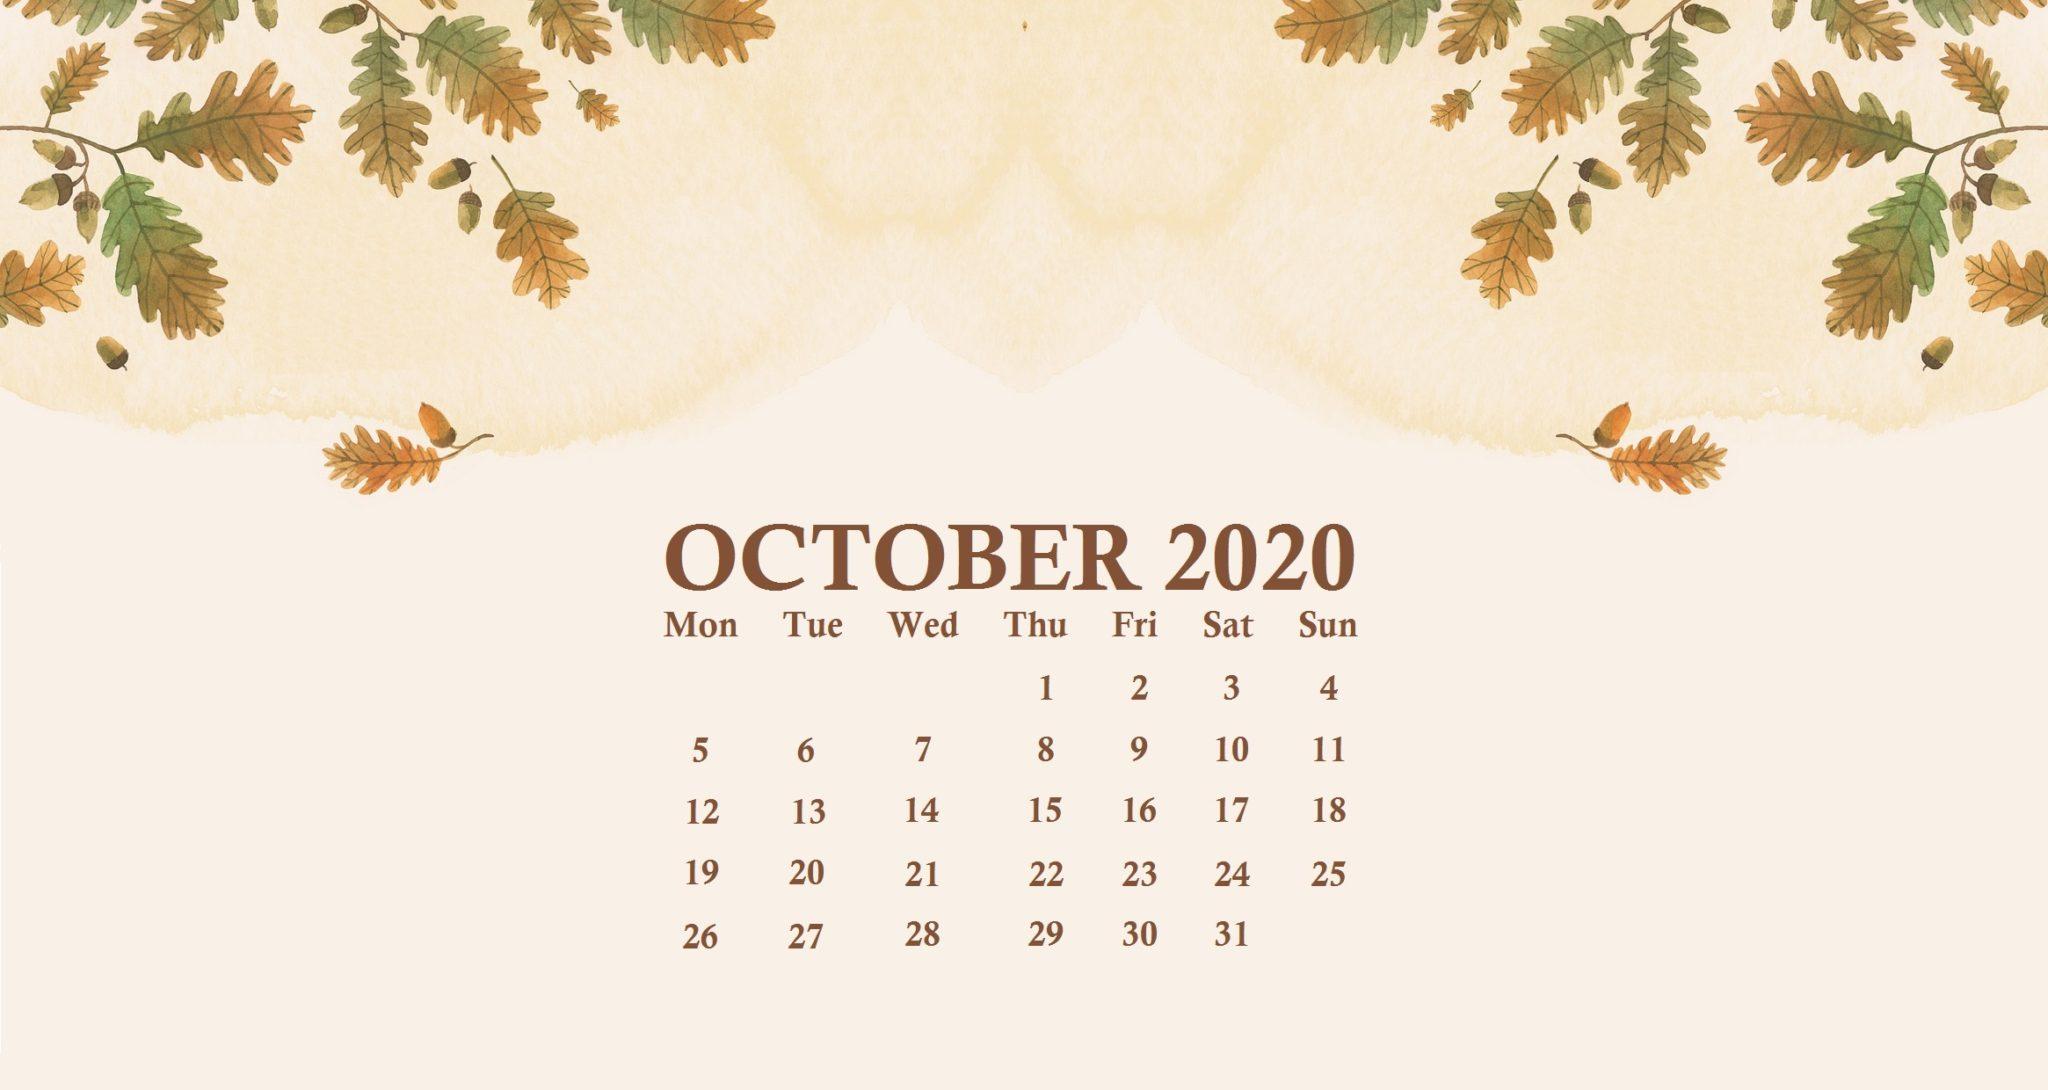 288 2881729 october 2020 calendar wallpaper calendar wallpaper october 2020